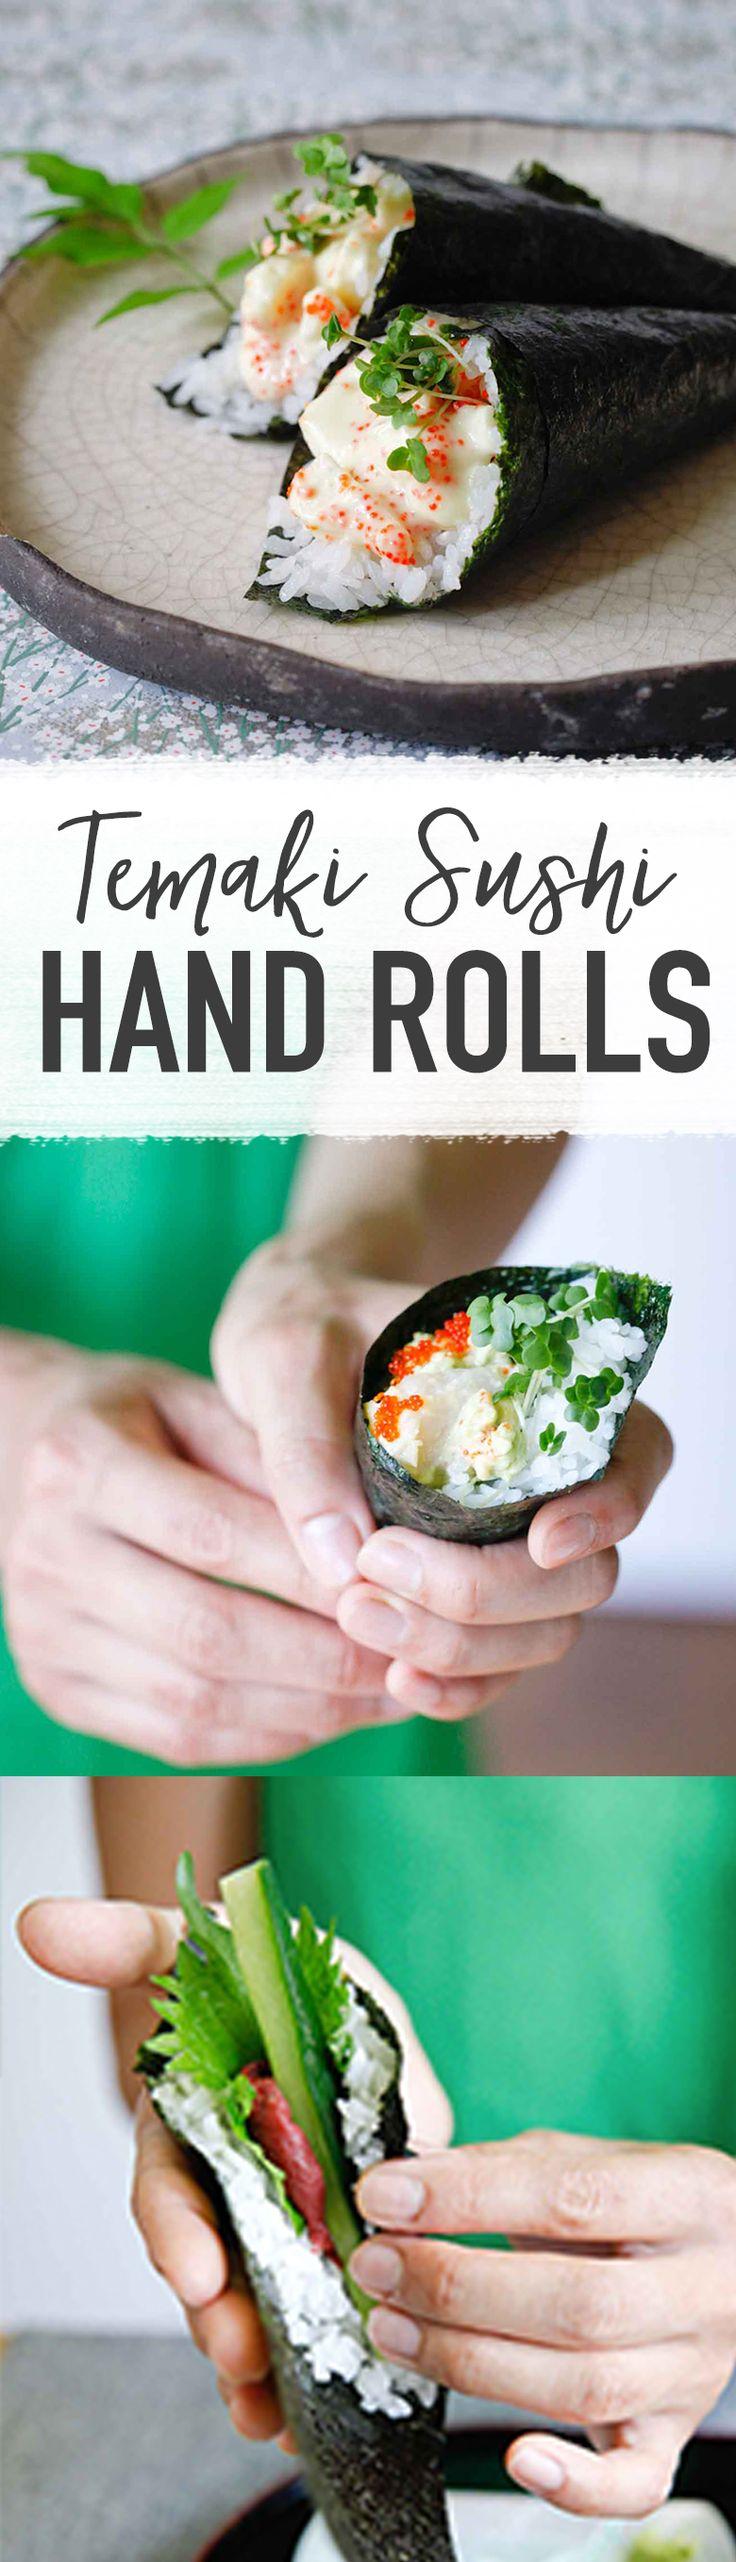 "Temaki Sushi Hand Rolls - From ""Sushi at Home"" by Yuki Gomi"